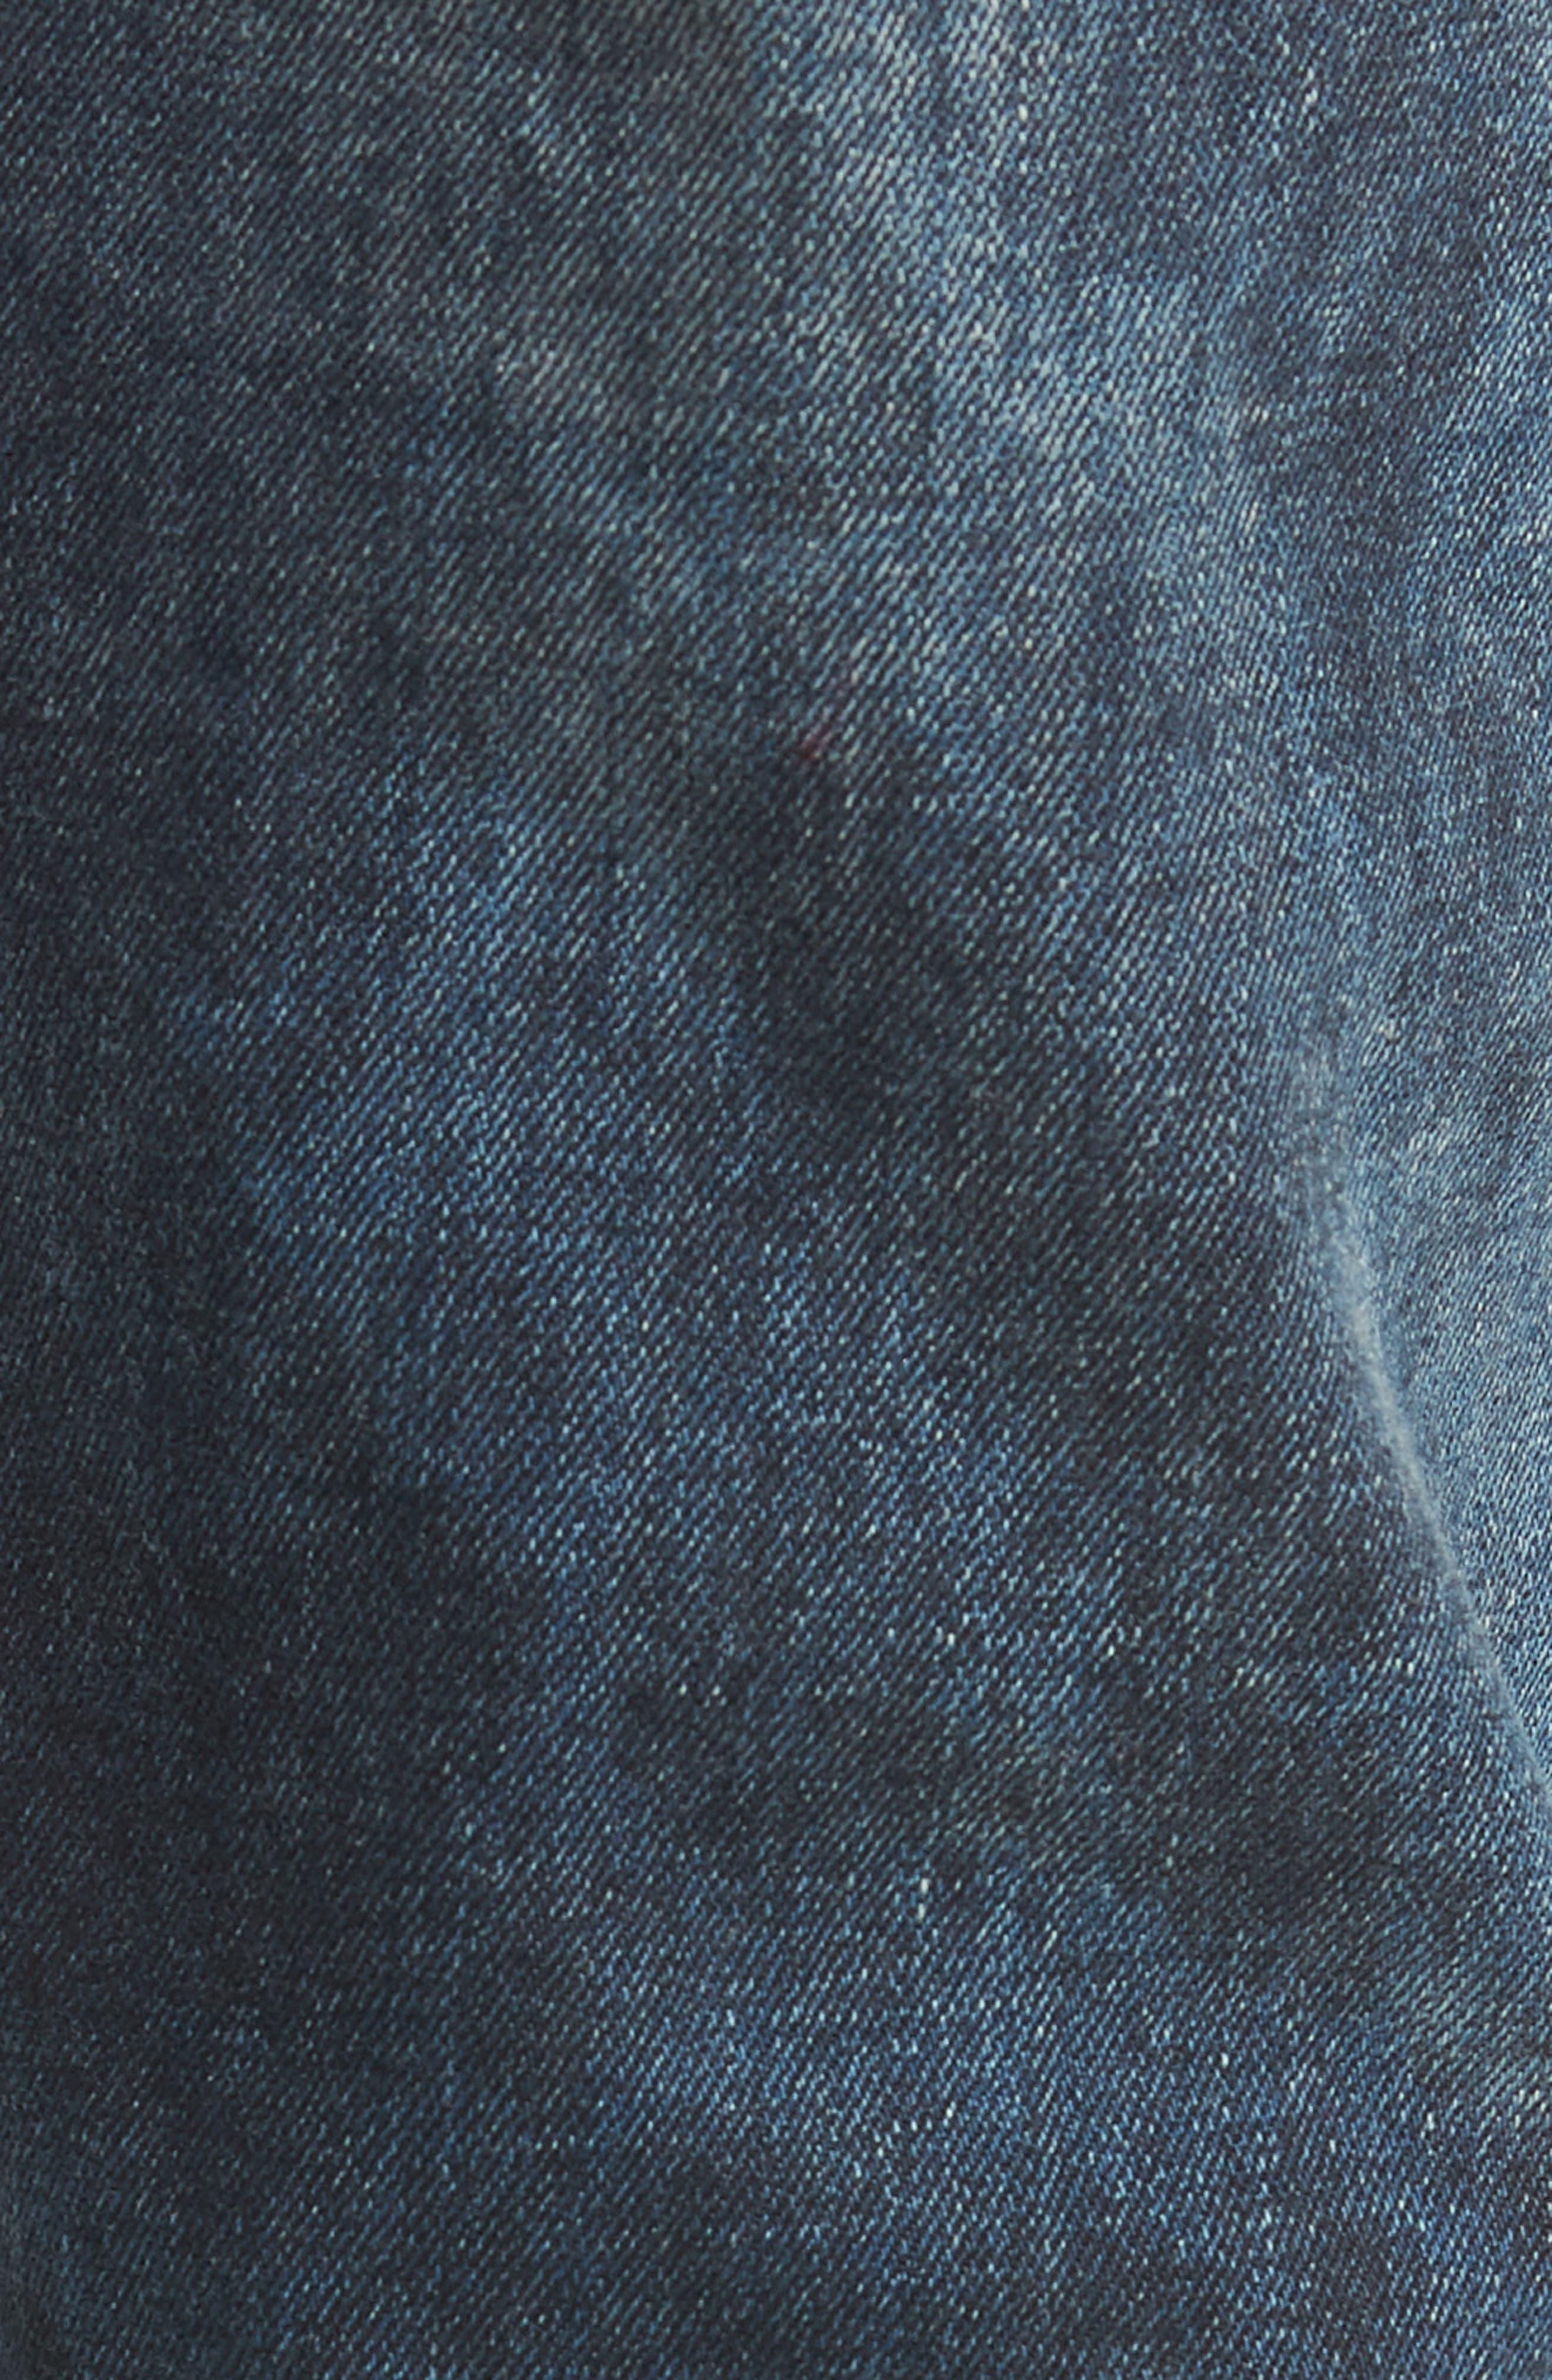 Blinder Biker Skinny Fit Jeans,                             Alternate thumbnail 5, color,                             MARTINO